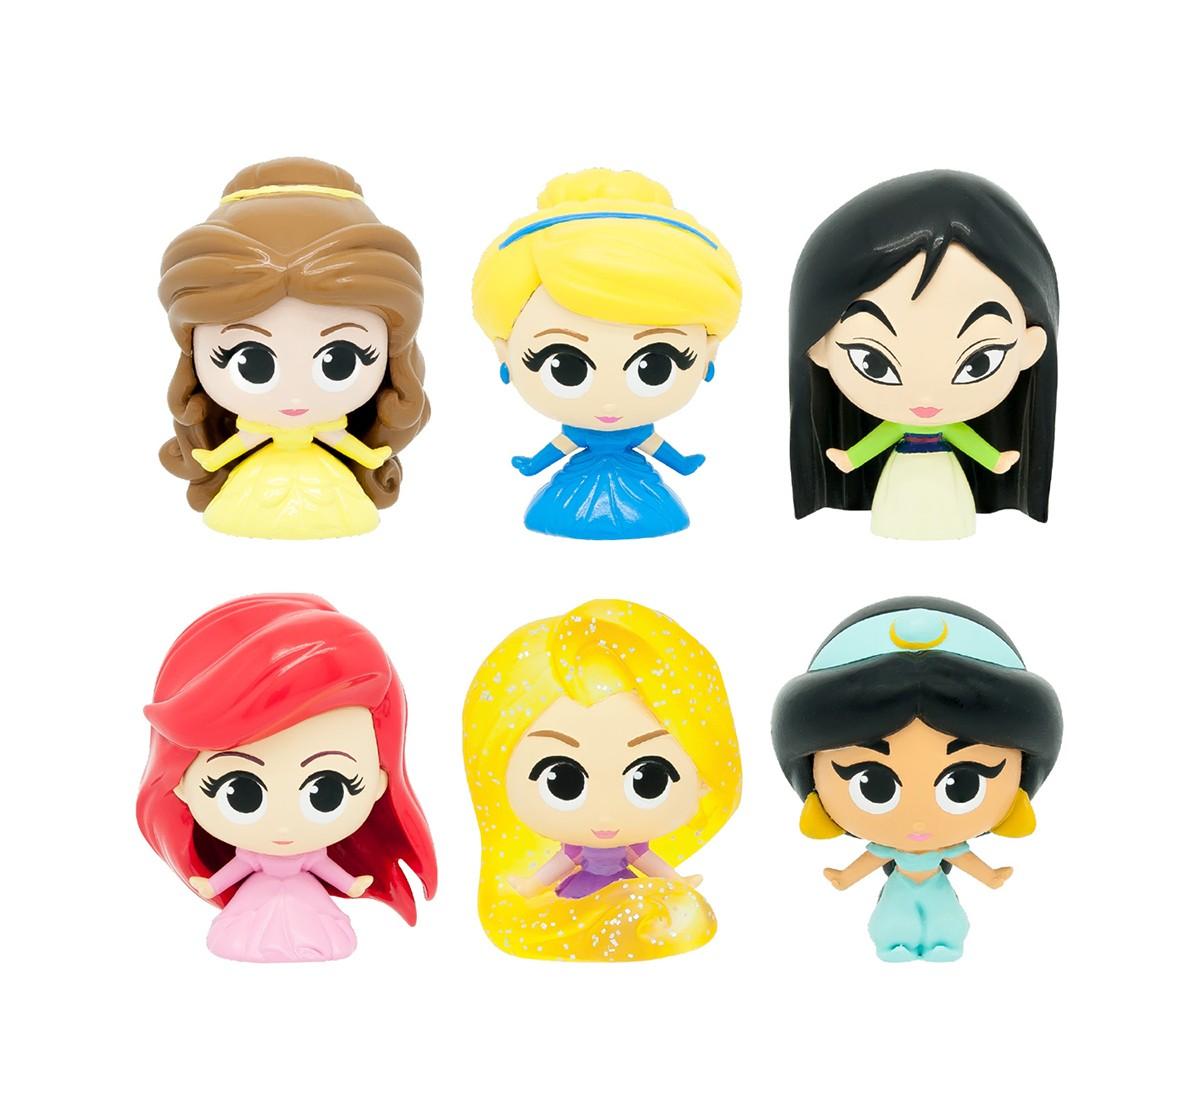 Fash'Ems Squishy Disney Princess S2 Toy Figures for Kids age 4Y+